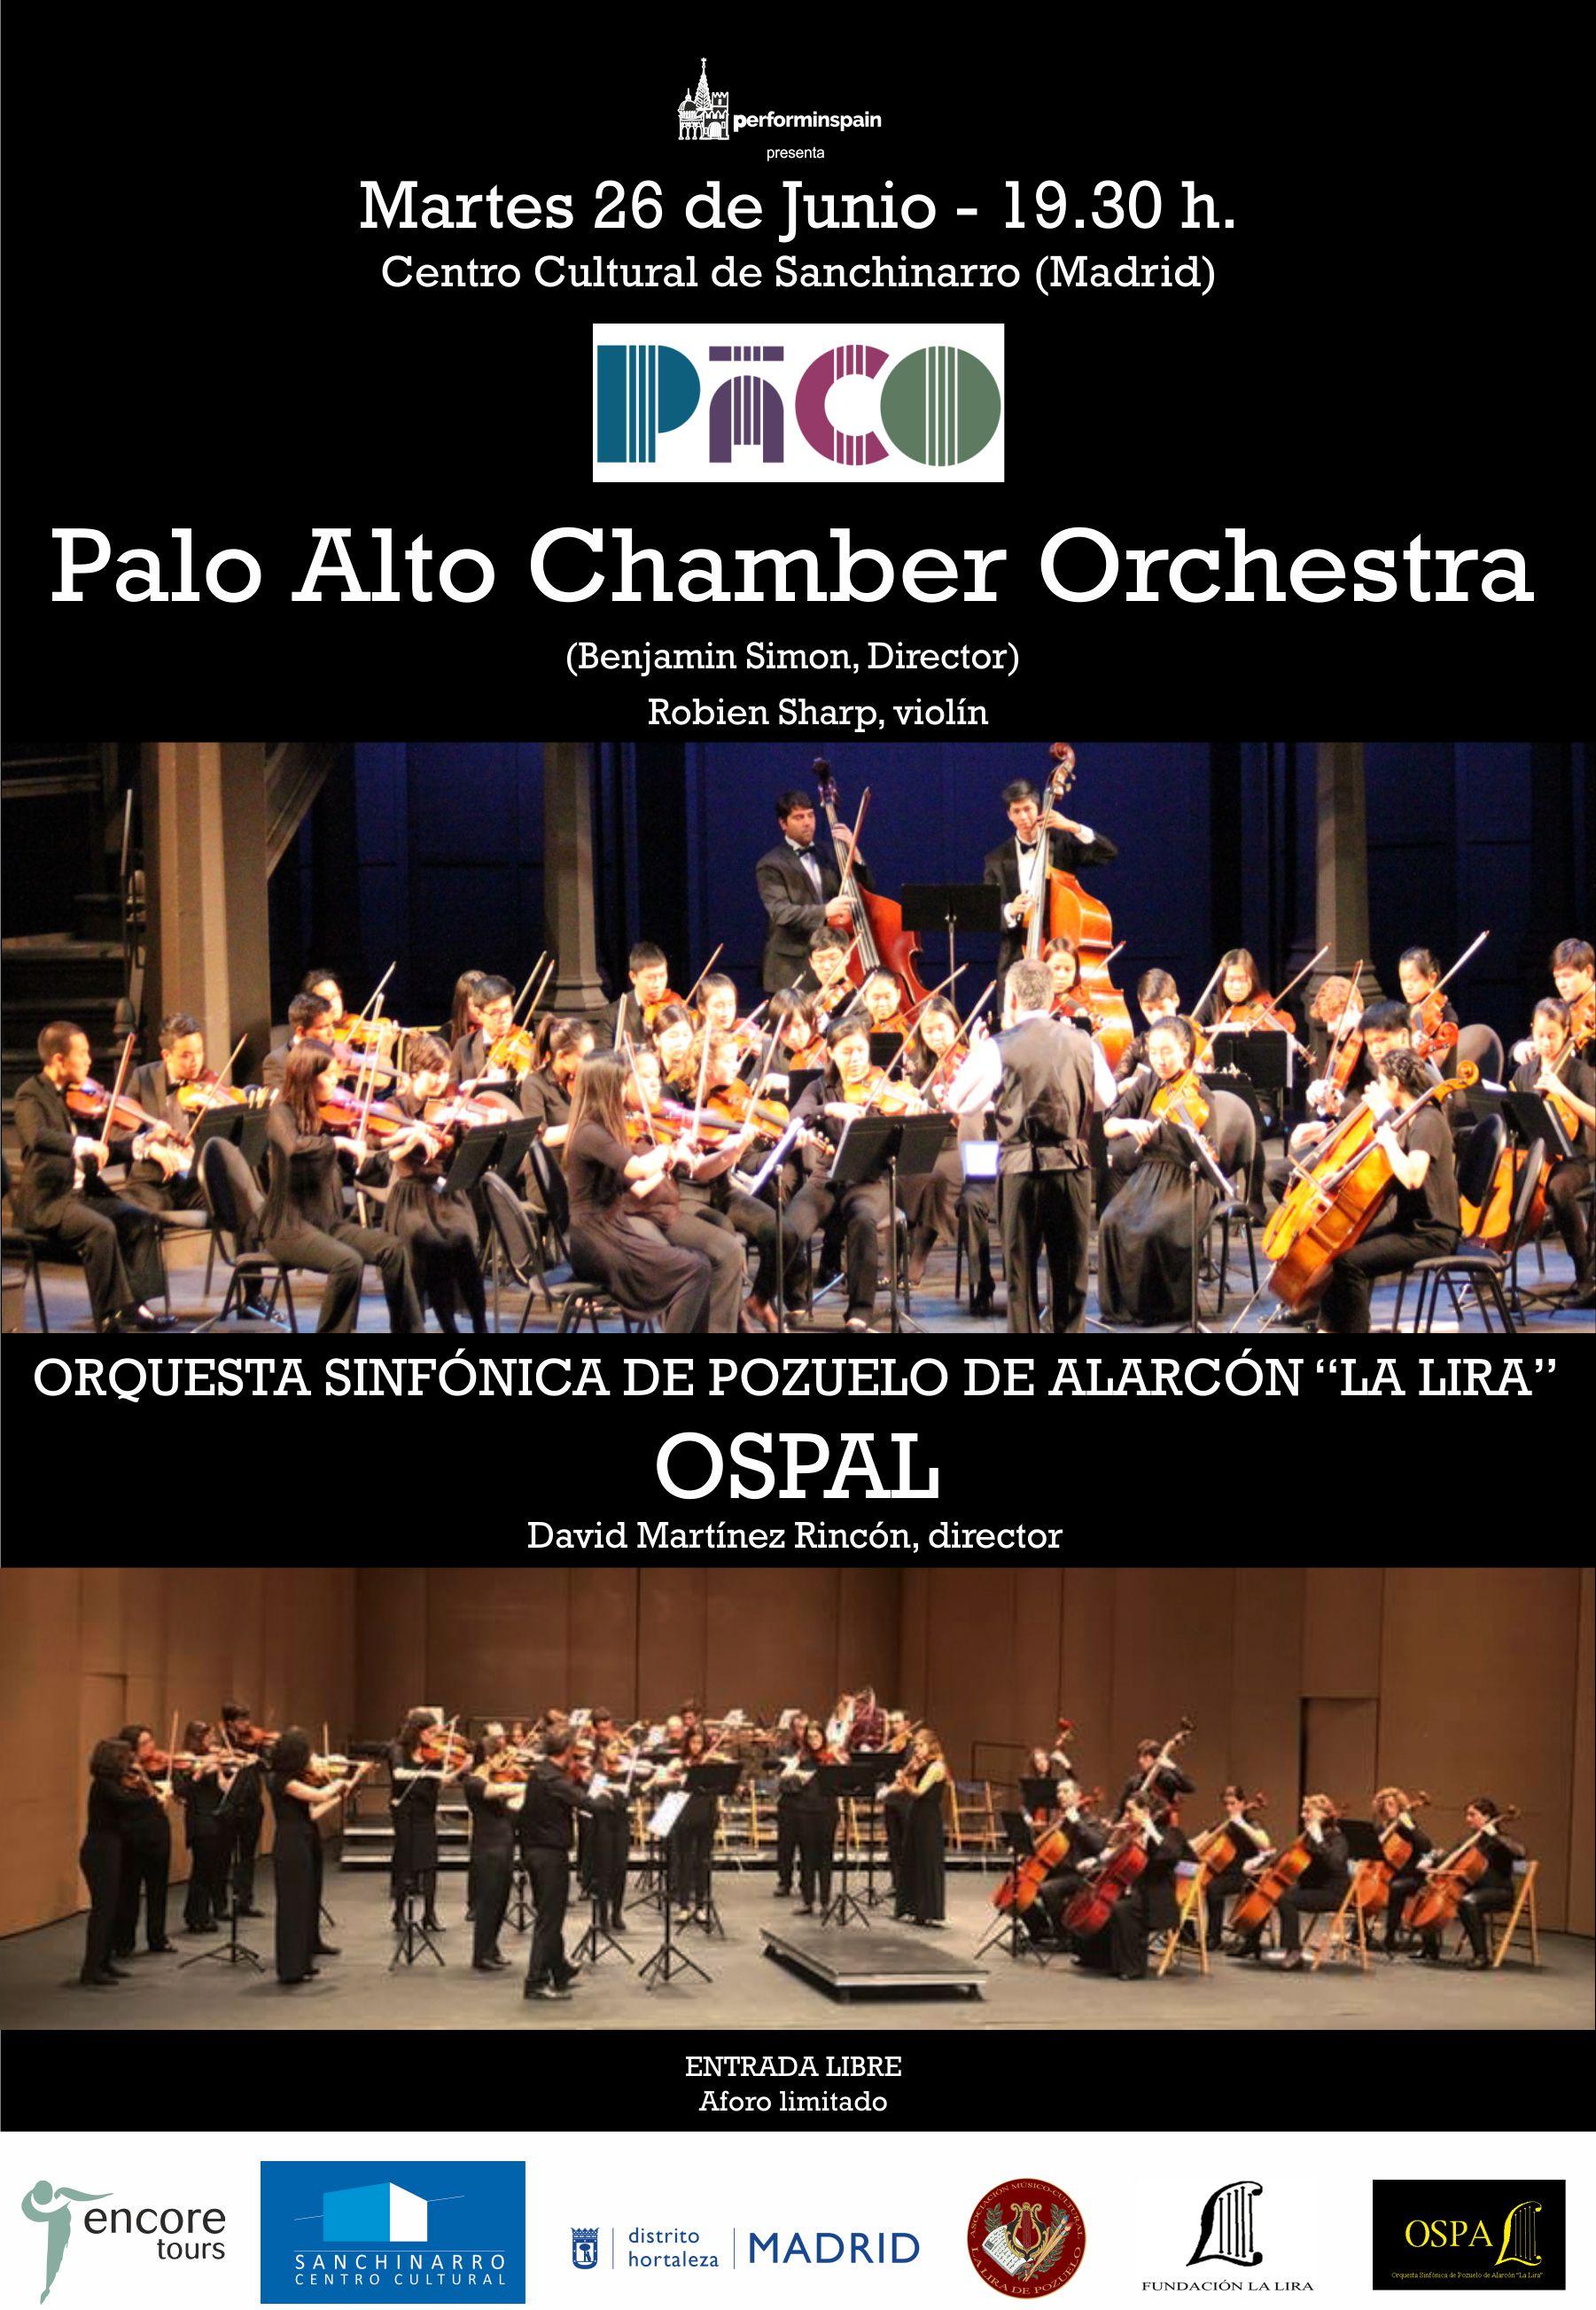 PALO ALTO CHAMBER ORCHESTRA Y LA OSPAL